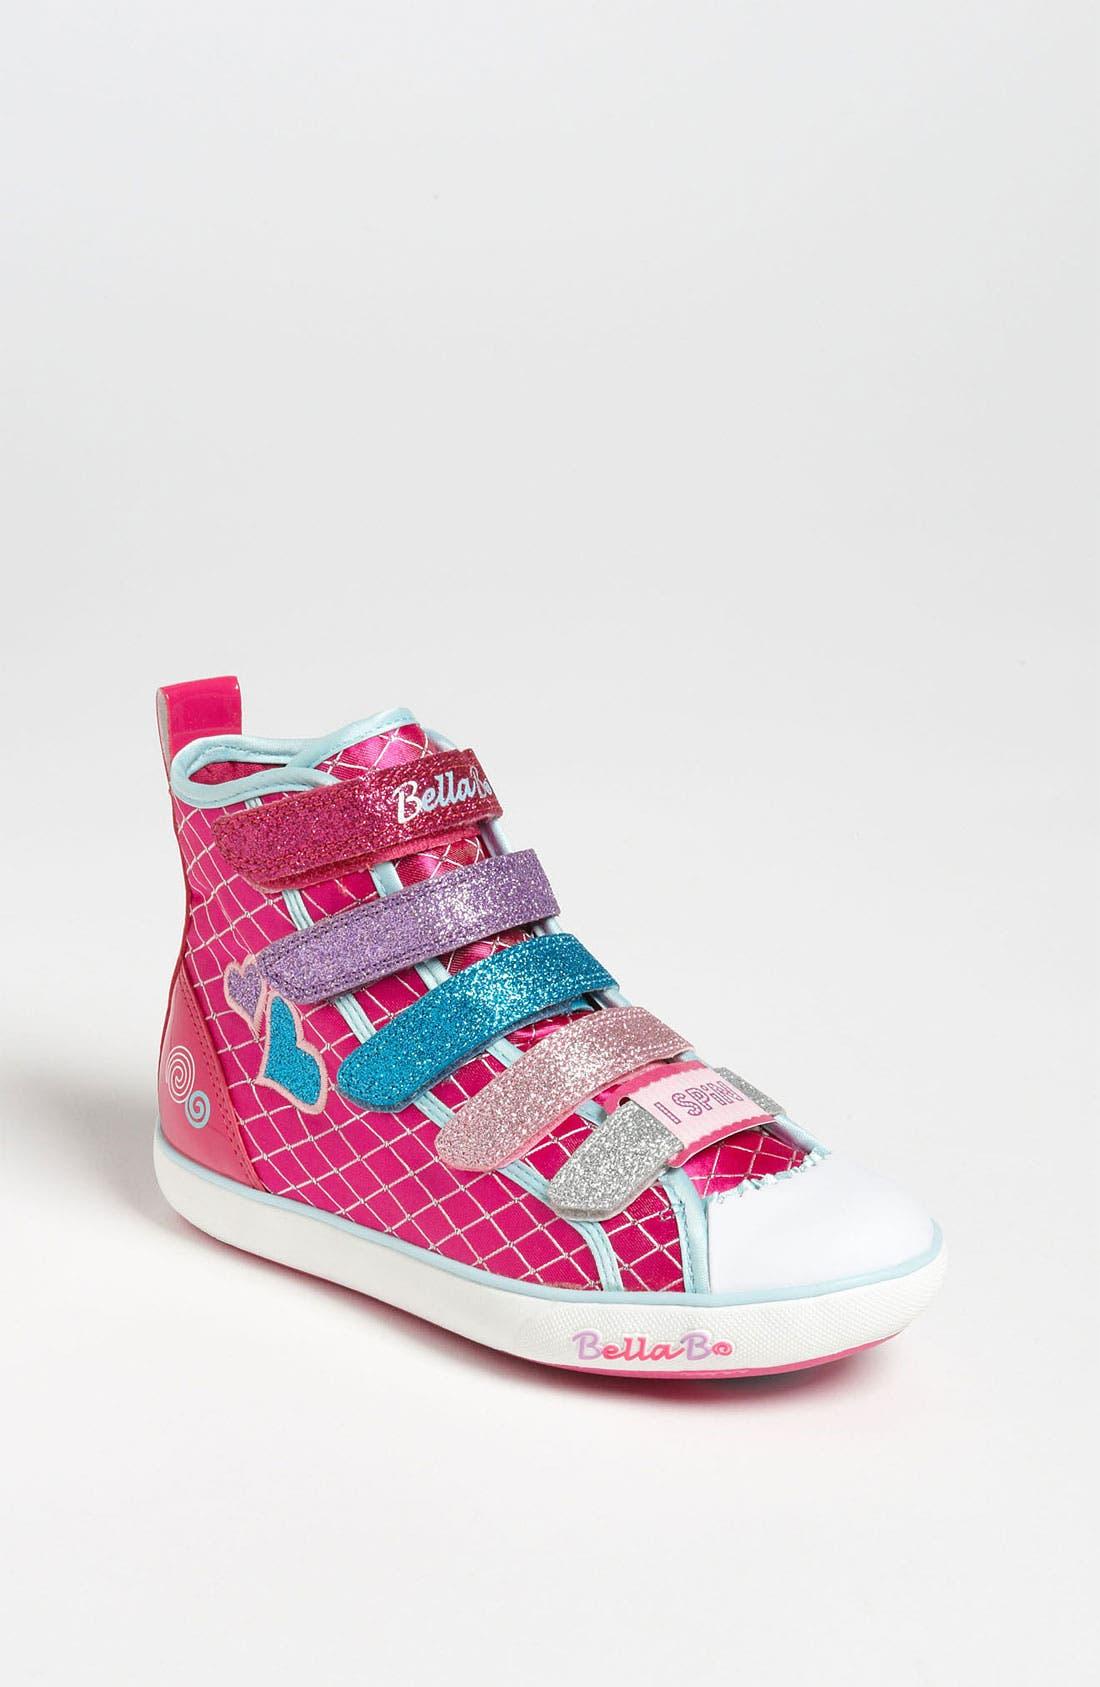 Main Image - SKECHERS 'Bella Ballerina - Curtsies' Sneaker (Toddler & Little Kid)